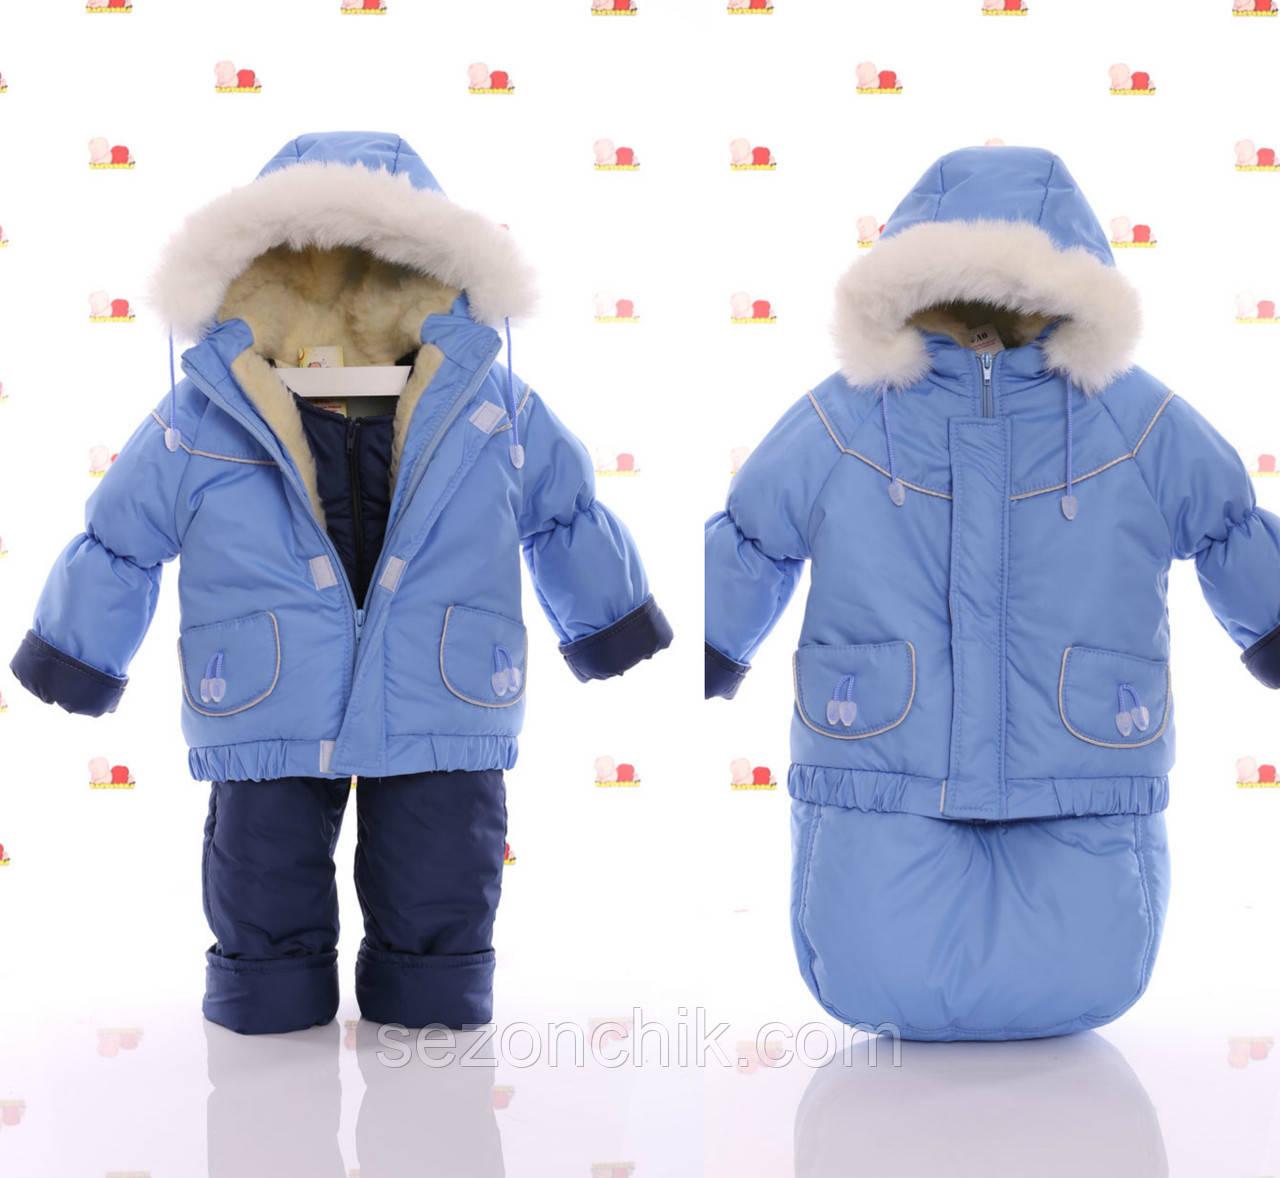 Зимний комбинезон для девочки зимний с мехом на капюшоне